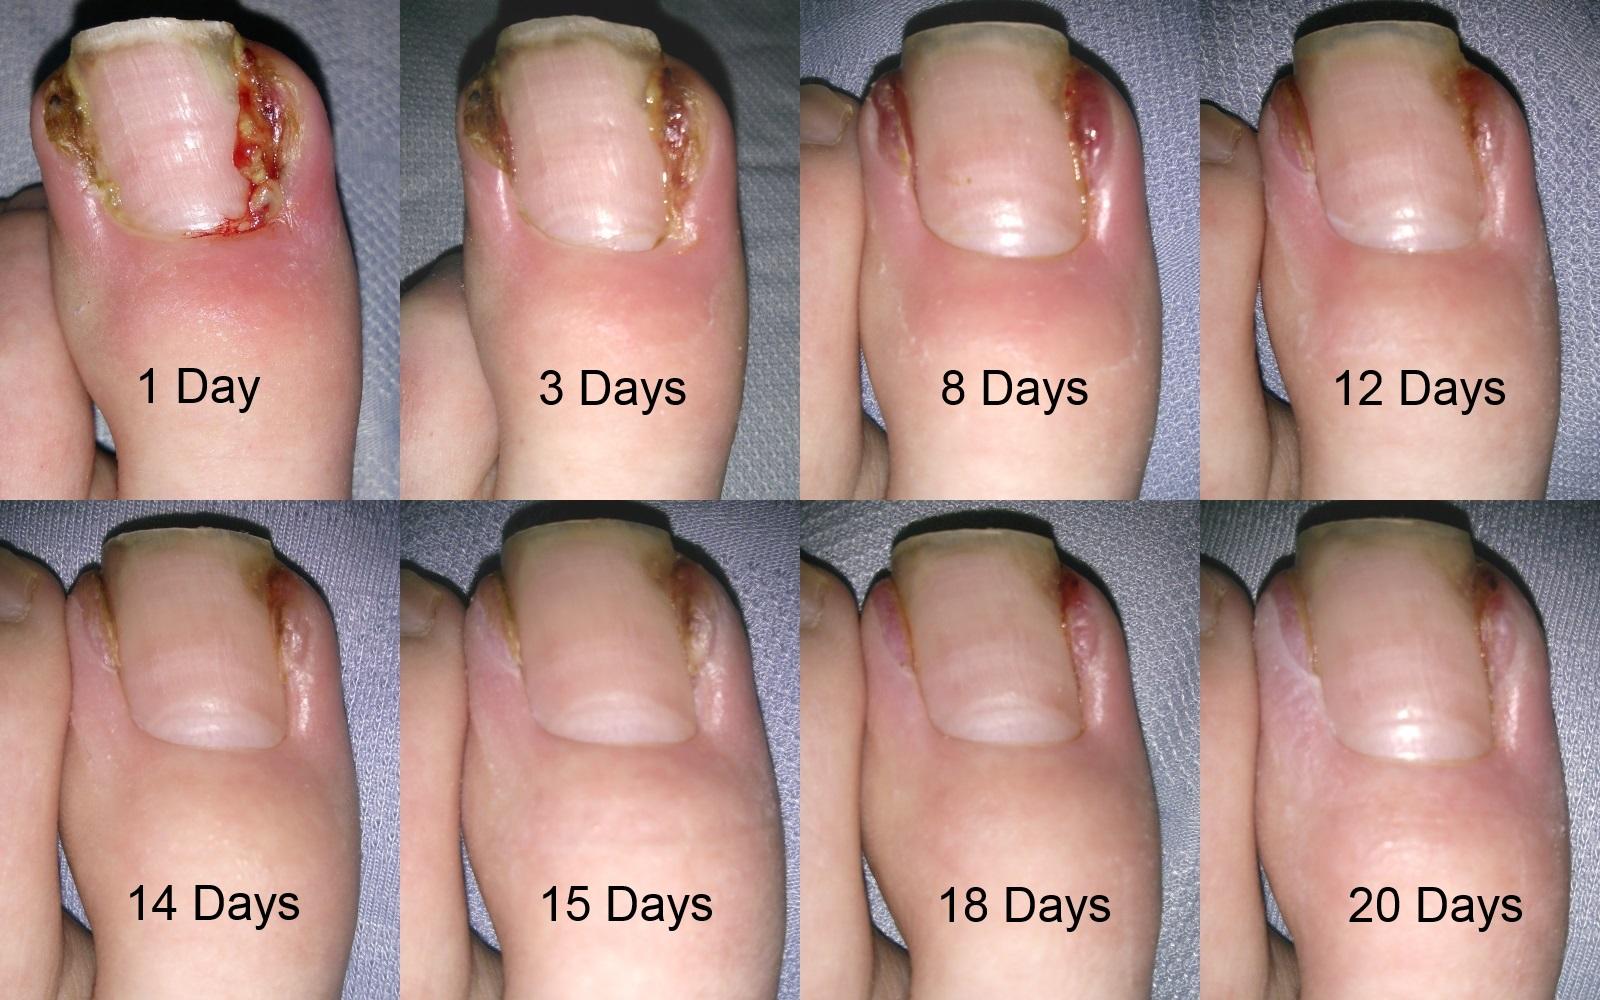 Infected Ingrowing Toenail Left Toe Treating Pseudomonas Aeruginosa With Tazocin